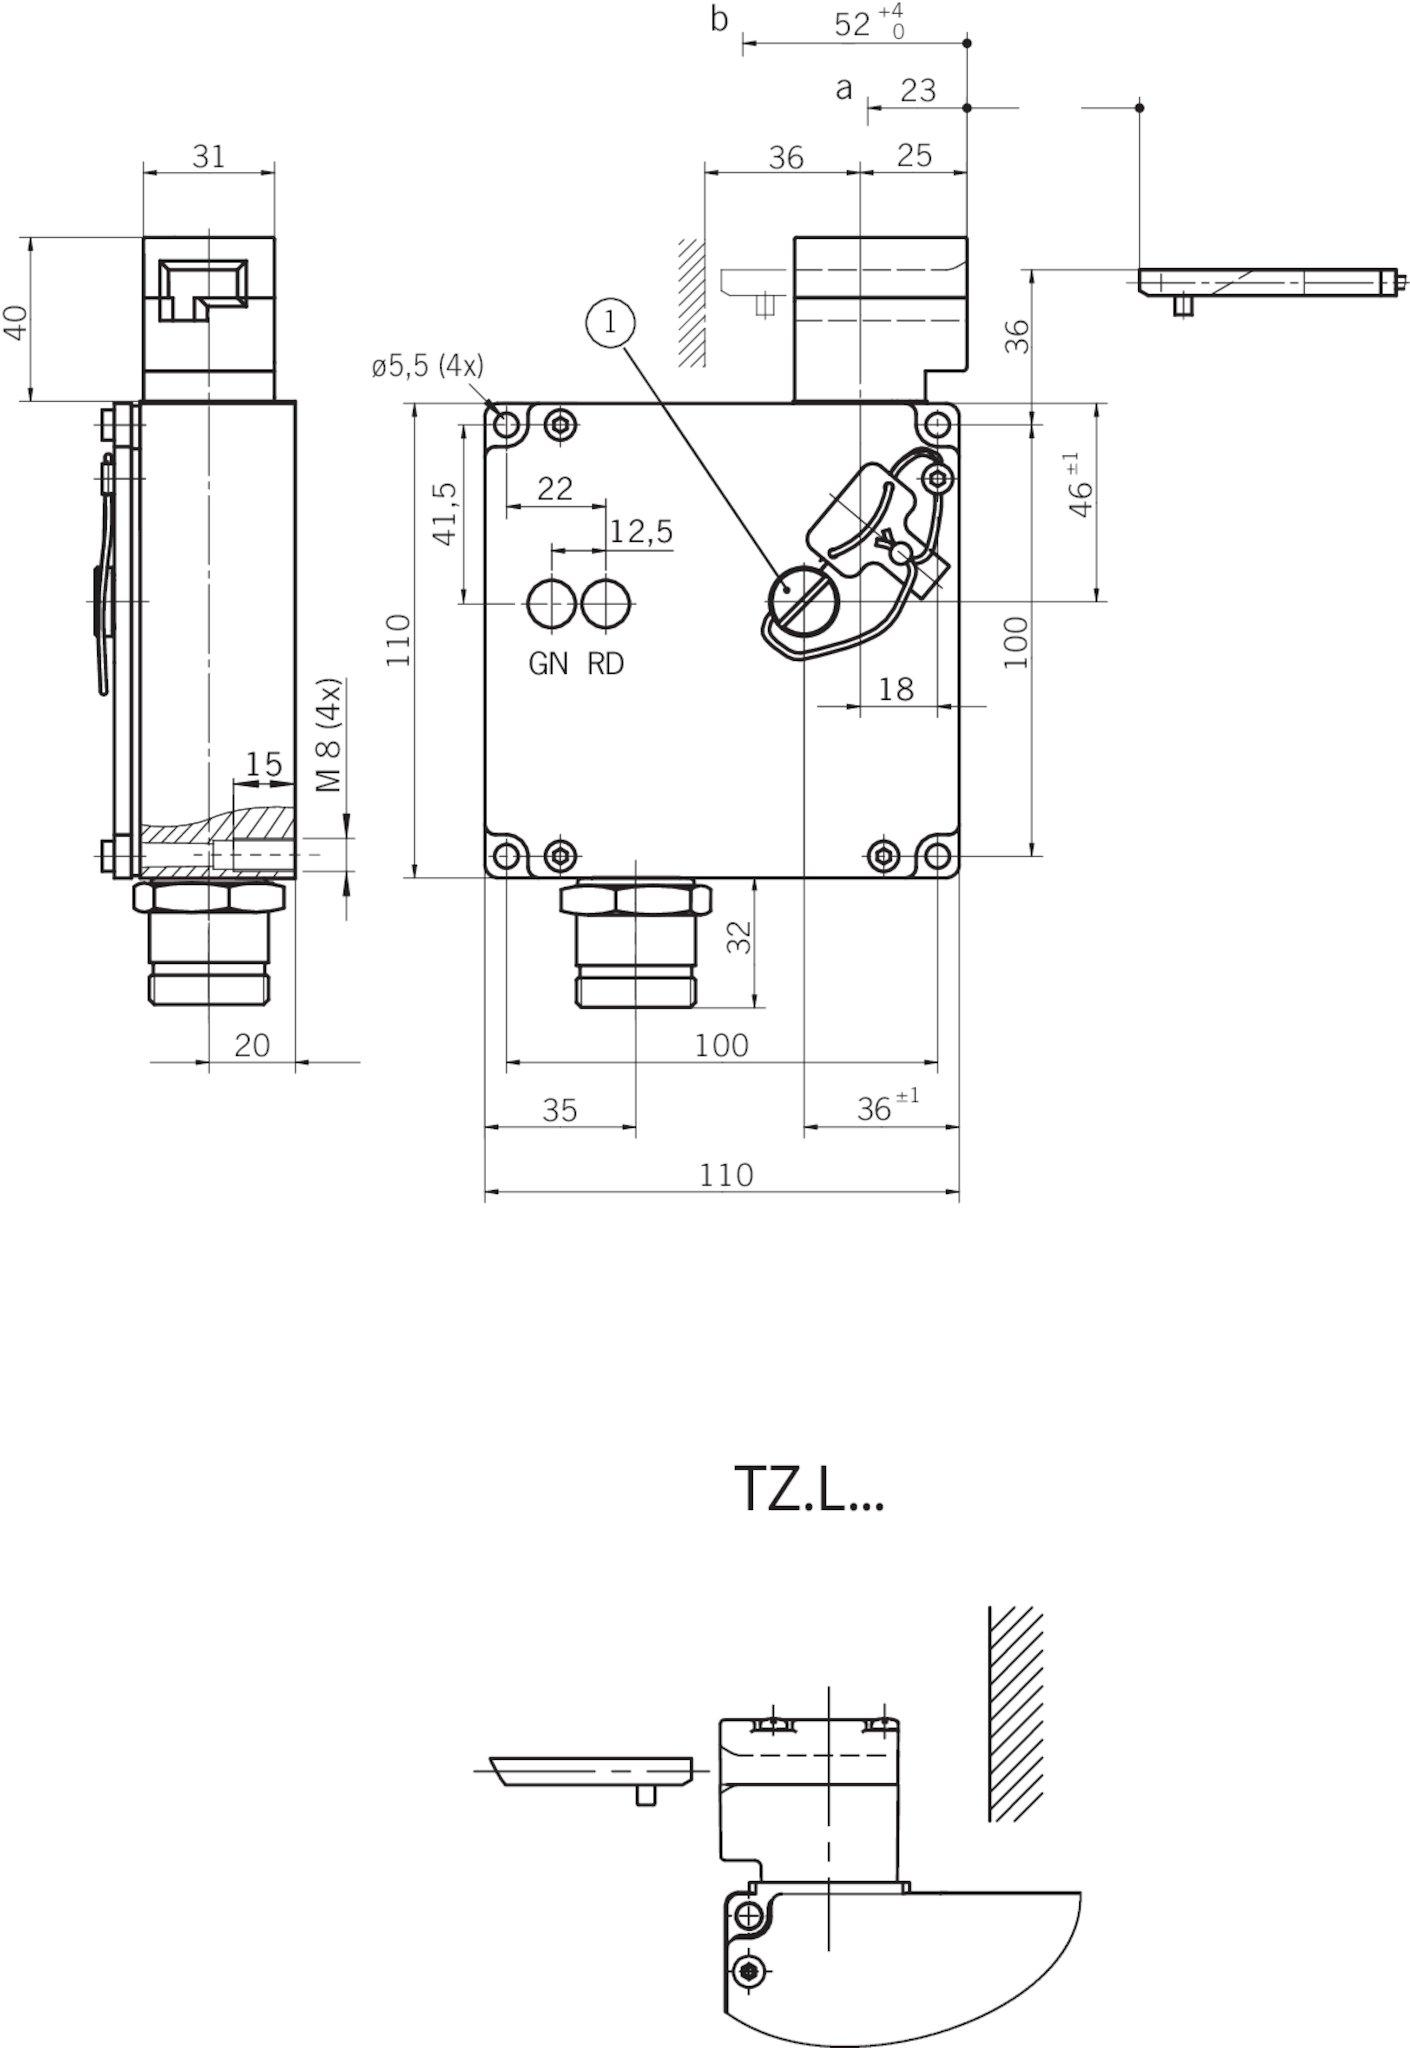 tz1le024bhavfg